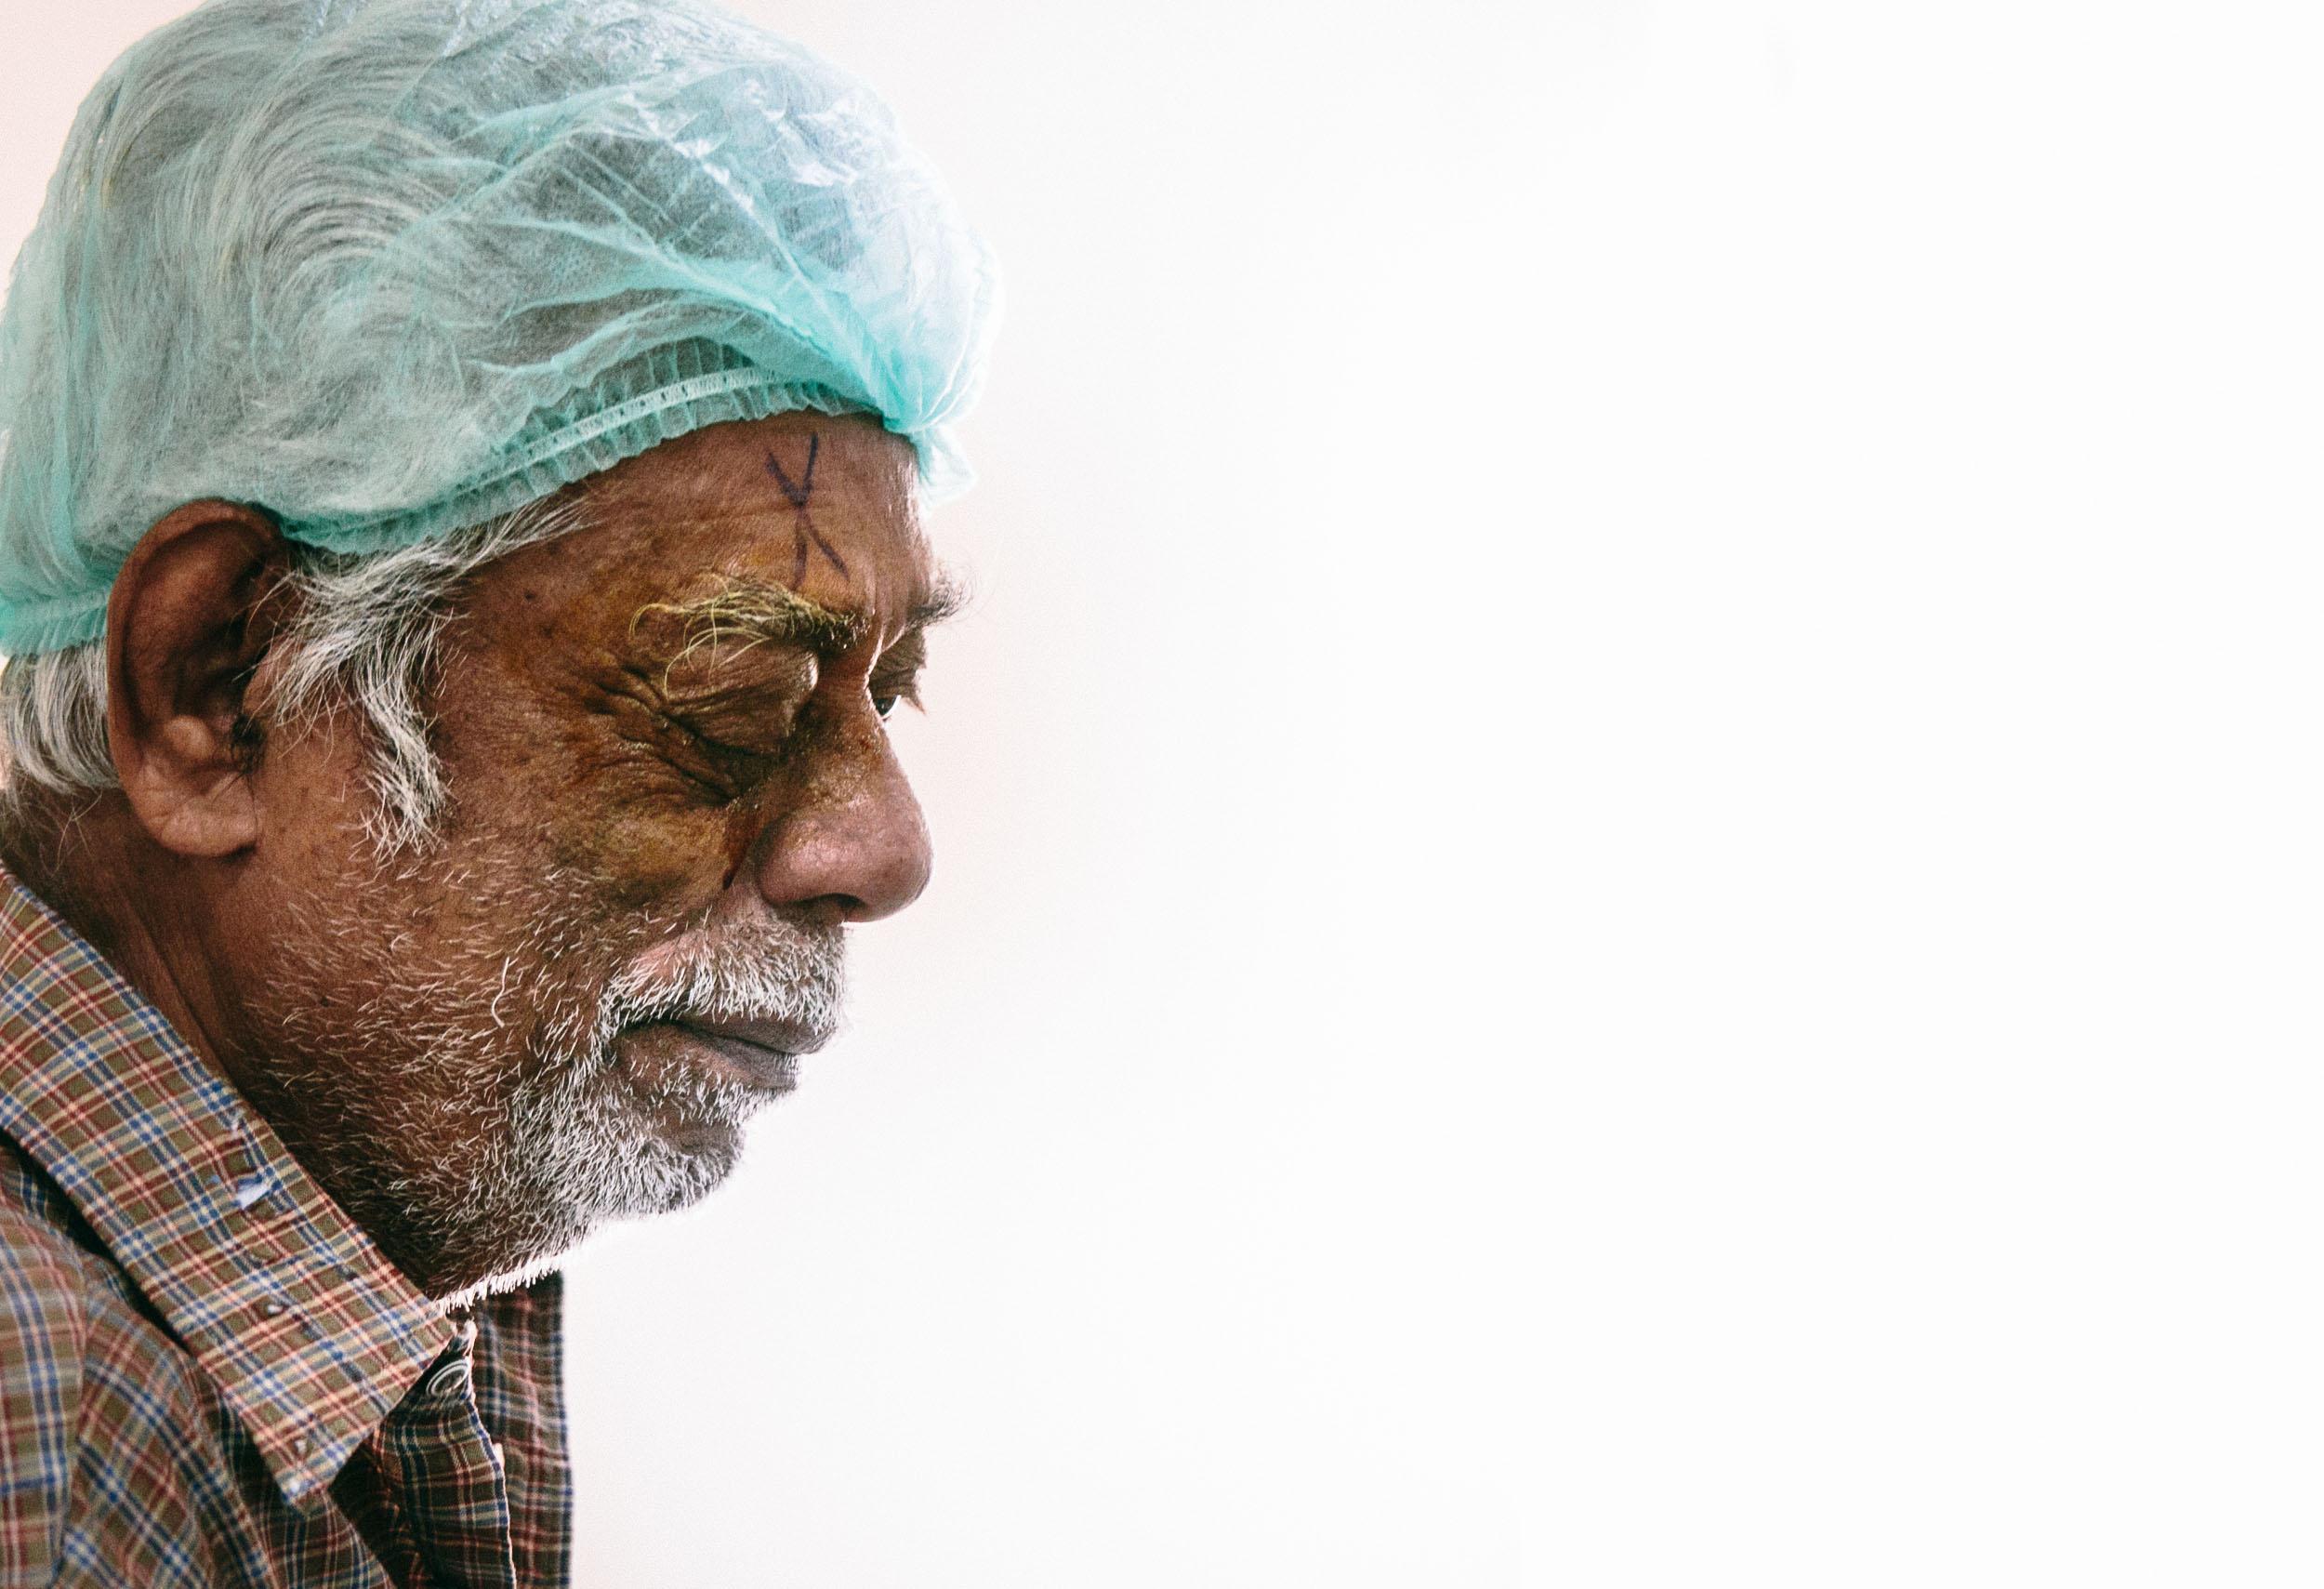 brian-callaway-india-photography-aravind-eye-hospital-37.jpg